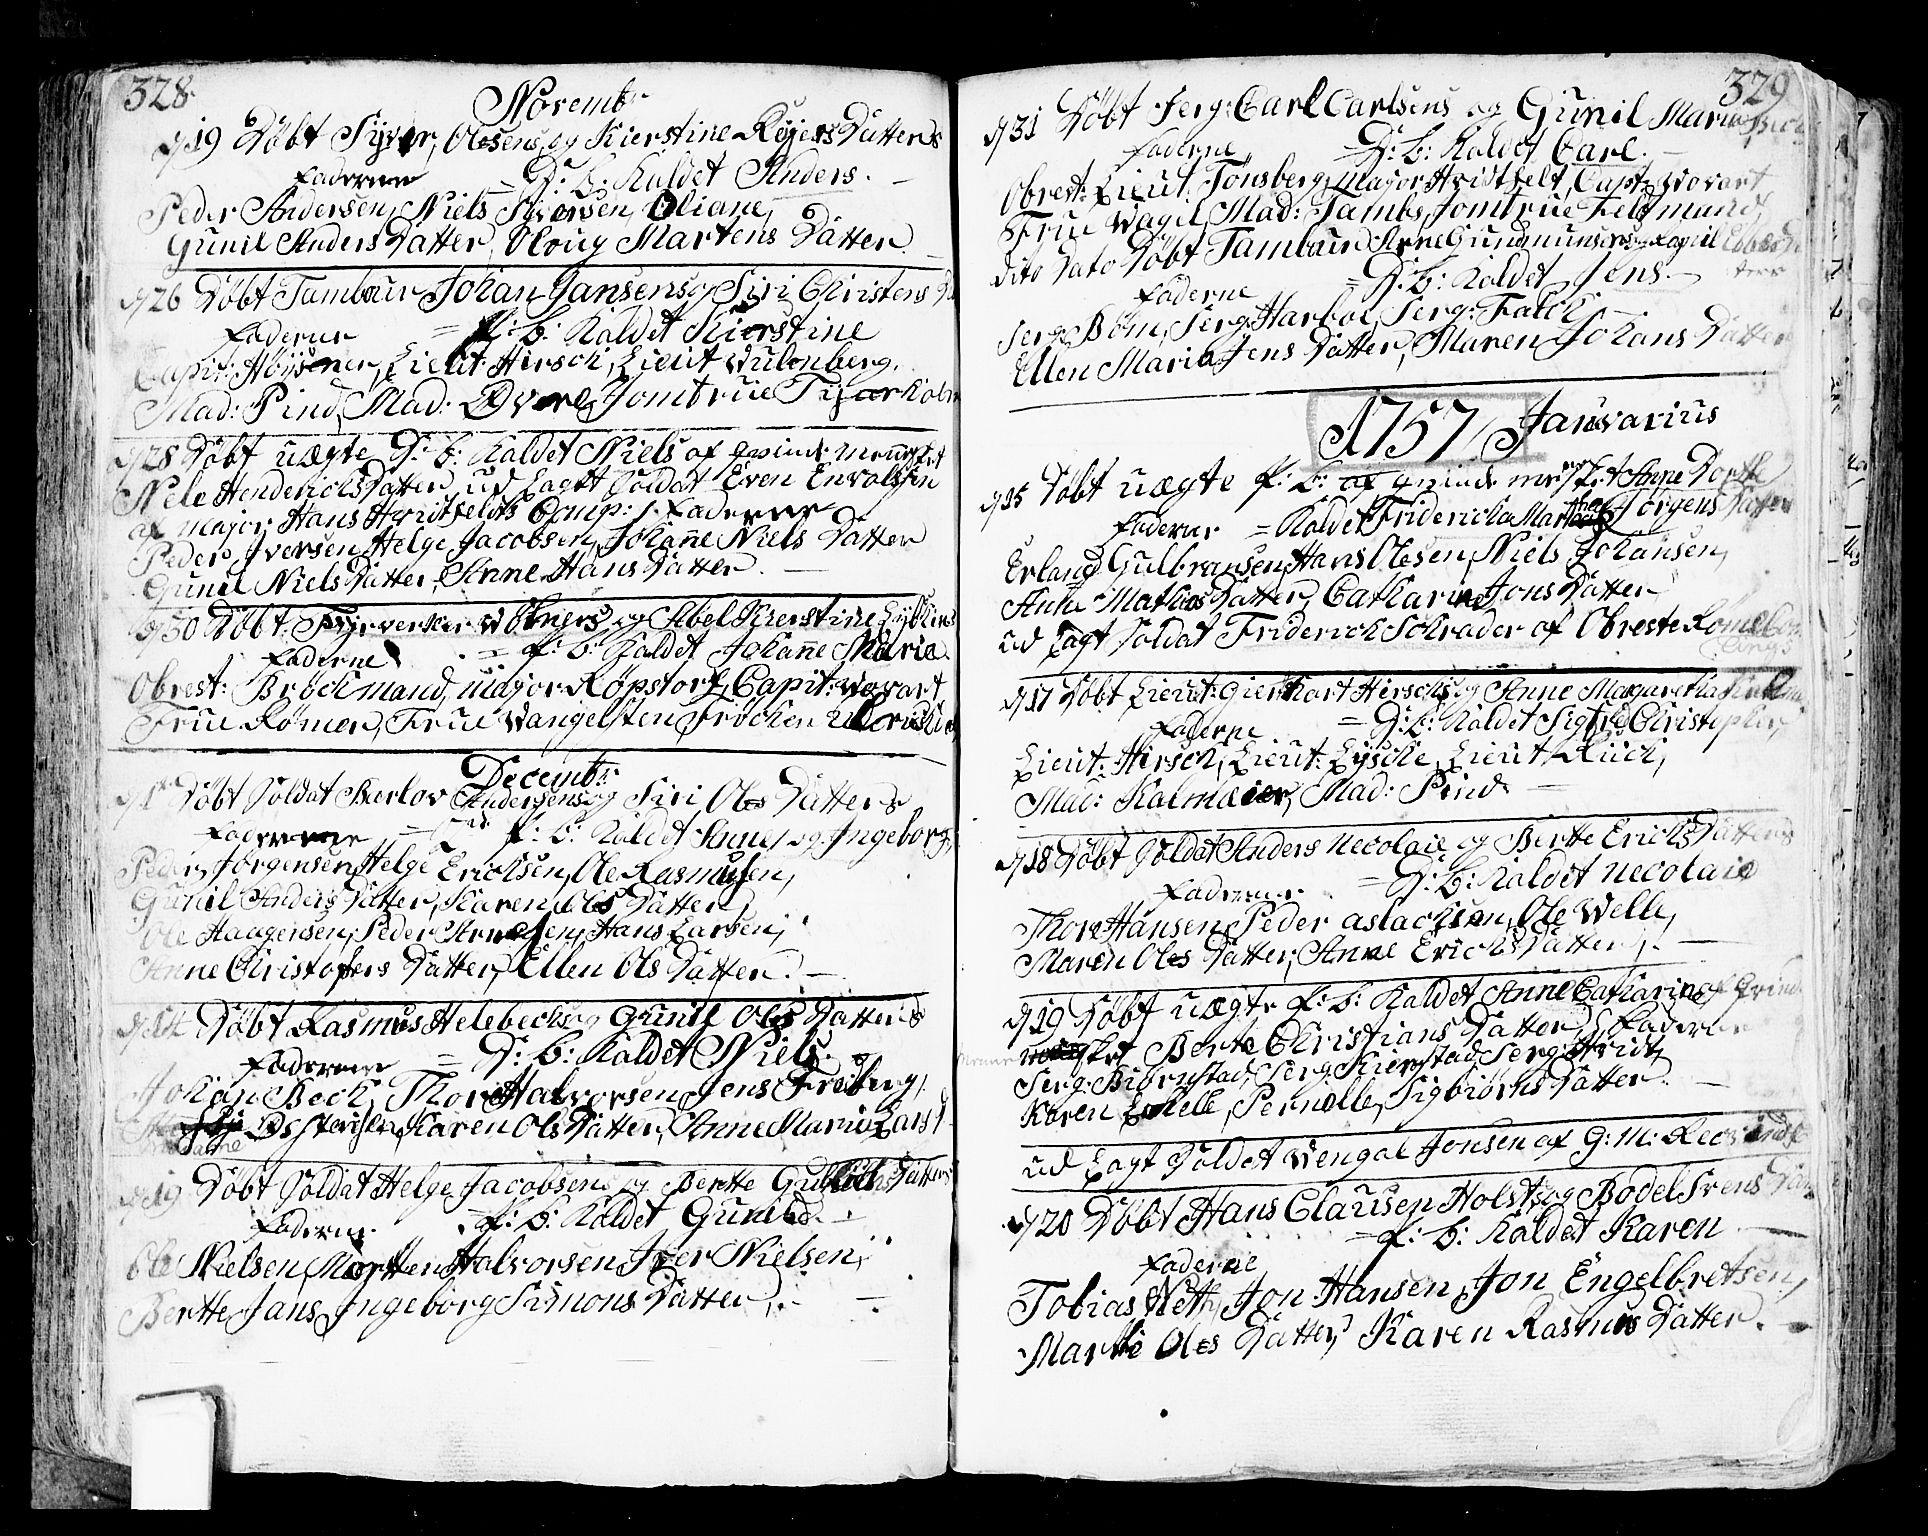 SAO, Fredrikstad prestekontor Kirkebøker, F/Fa/L0002: Ministerialbok nr. 2, 1750-1804, s. 328-329